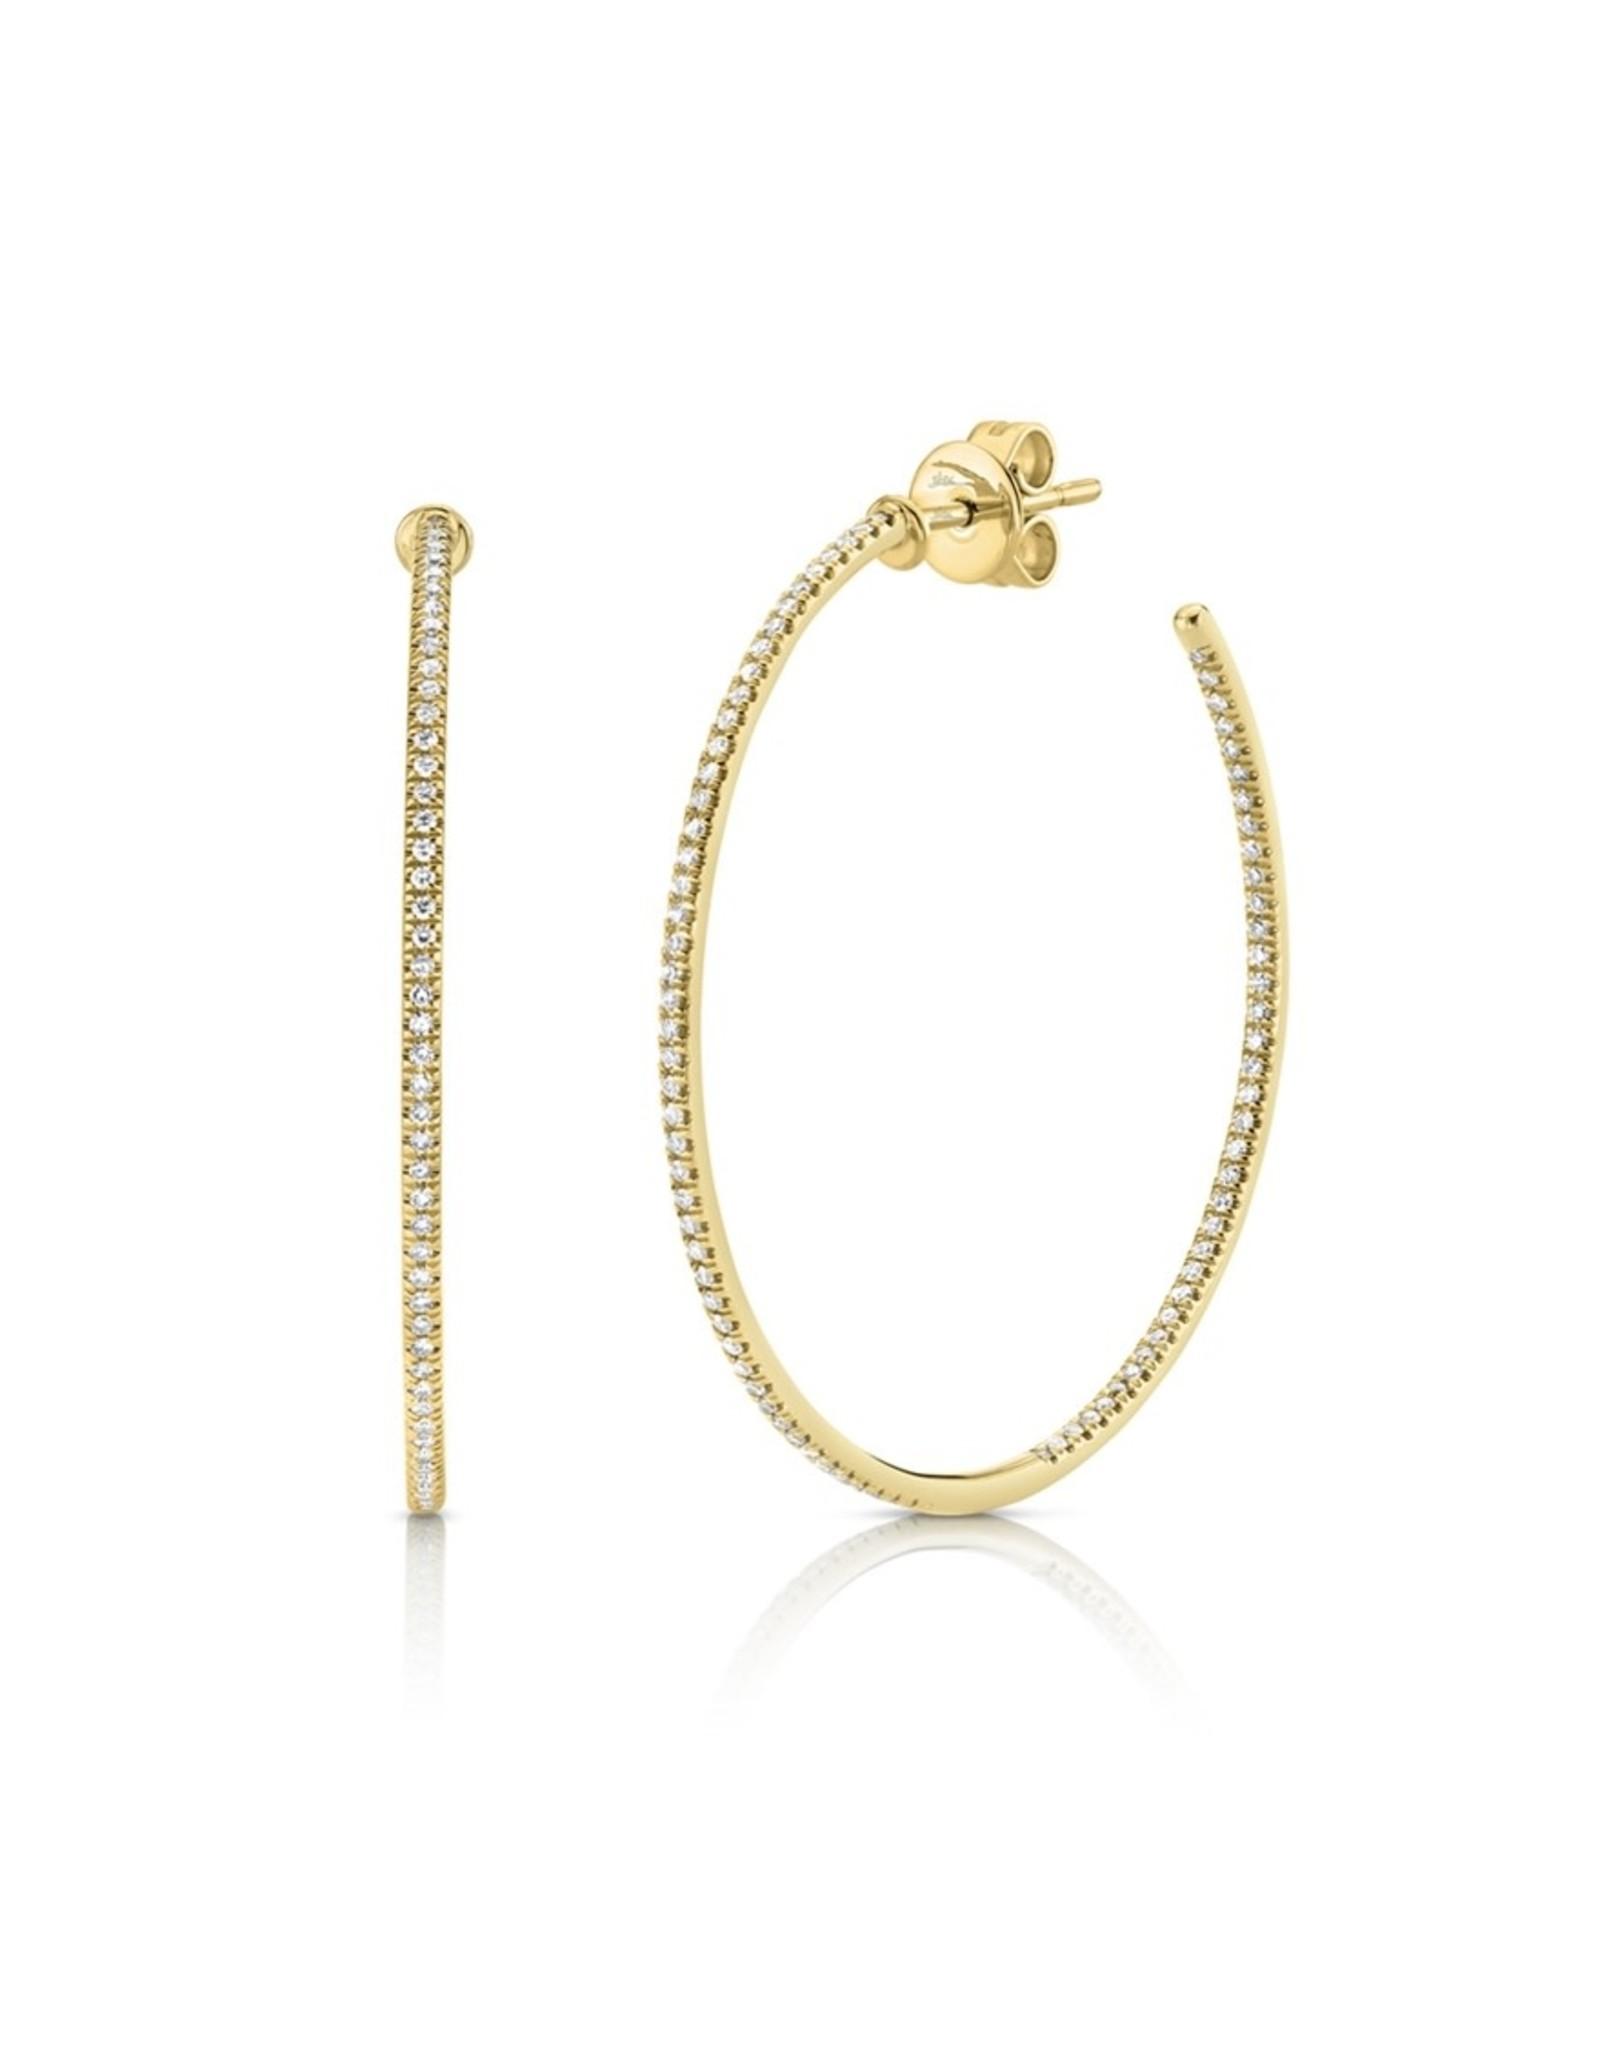 14K Yellow Gold Skinny Diamond Hoop Earrings,  D: 0.36ct